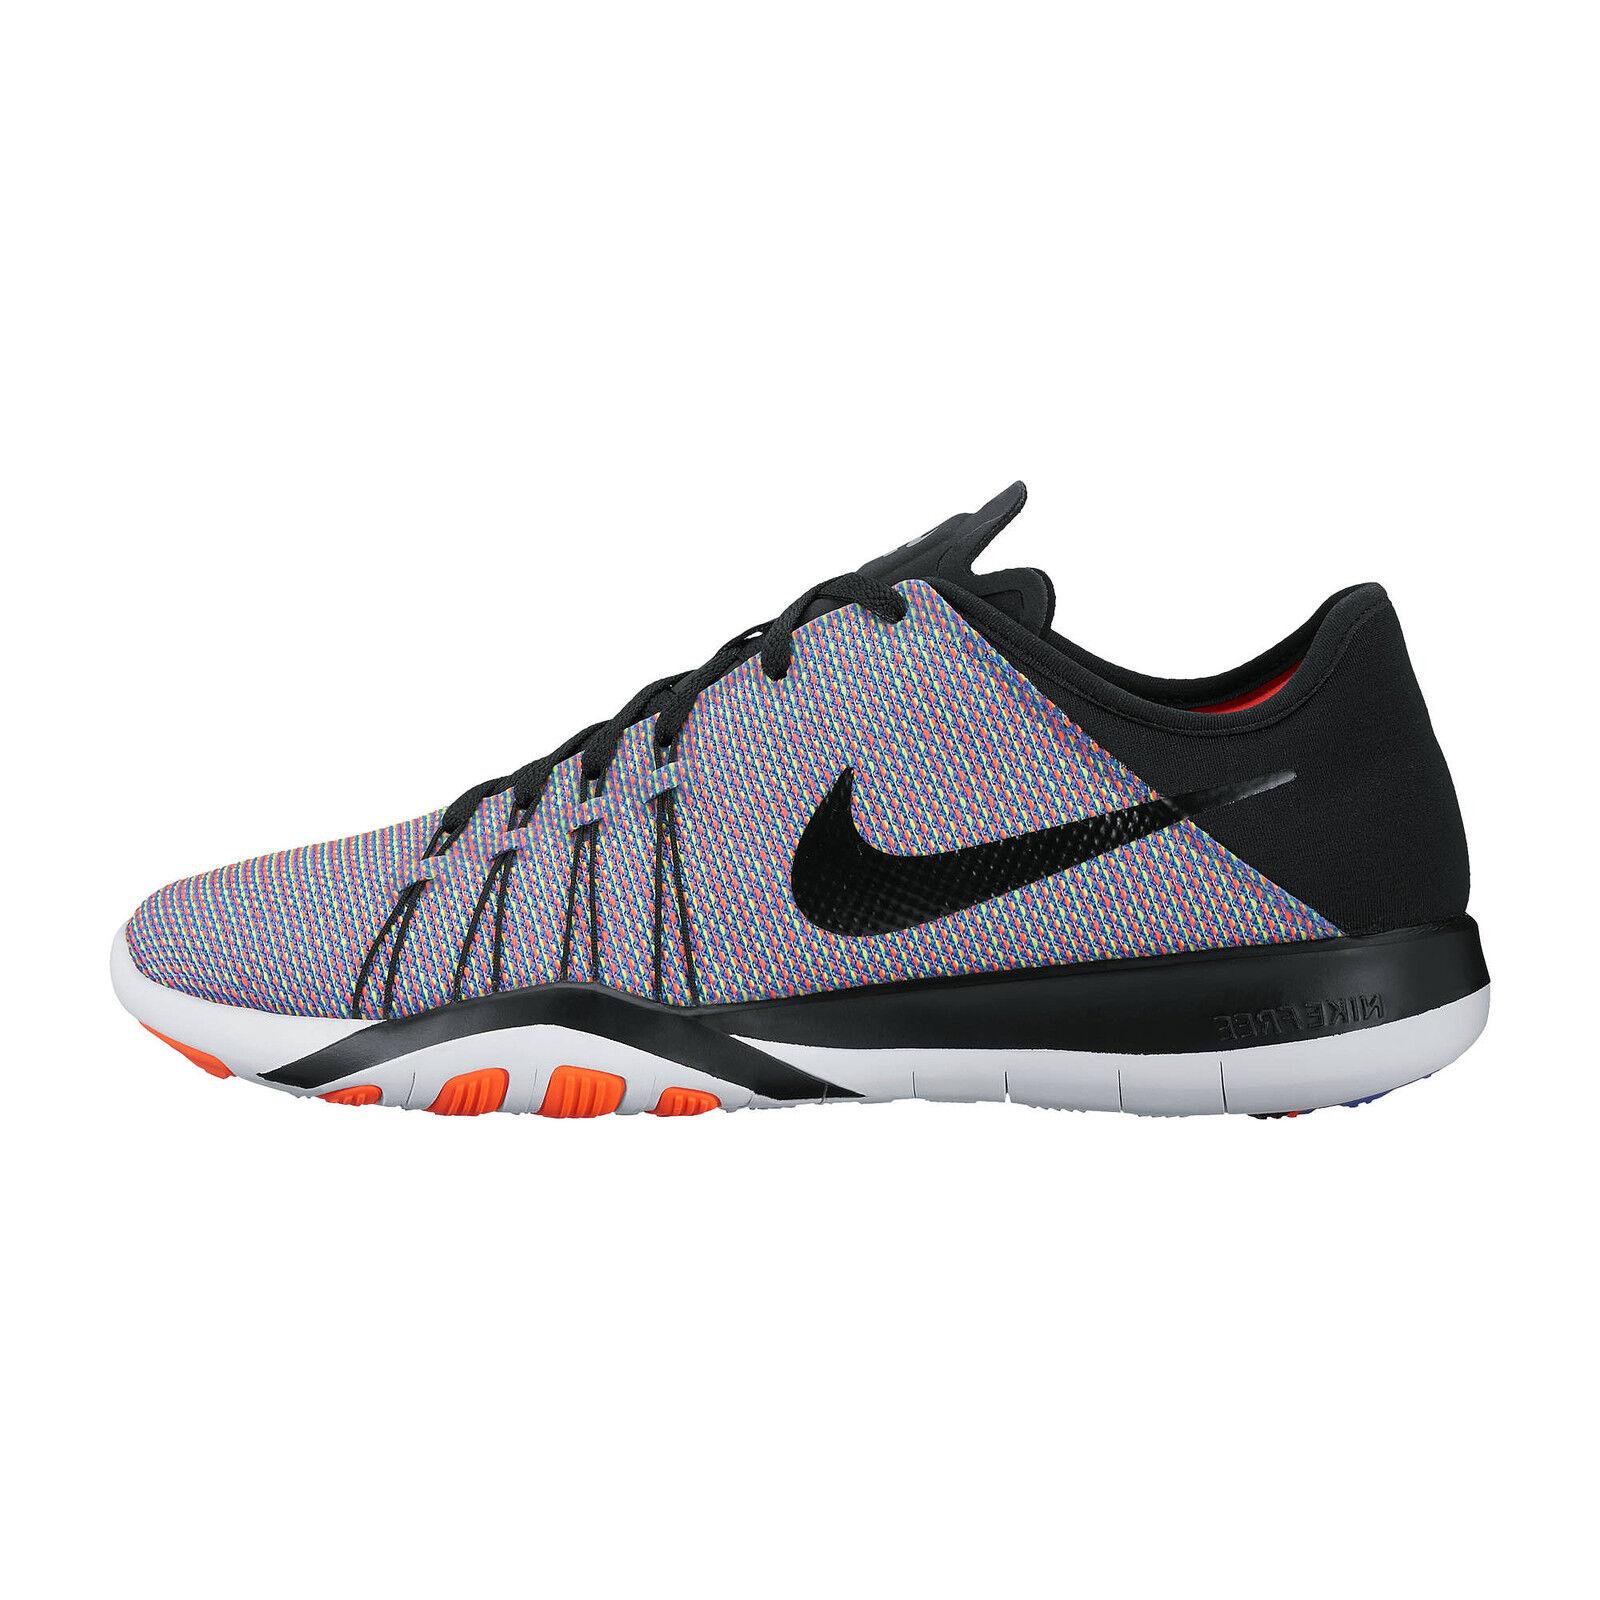 Zapatos casuales salvajes Wmns Nike Free TR 6 PRT 833424-006 zapato deportivo mentecato cortos